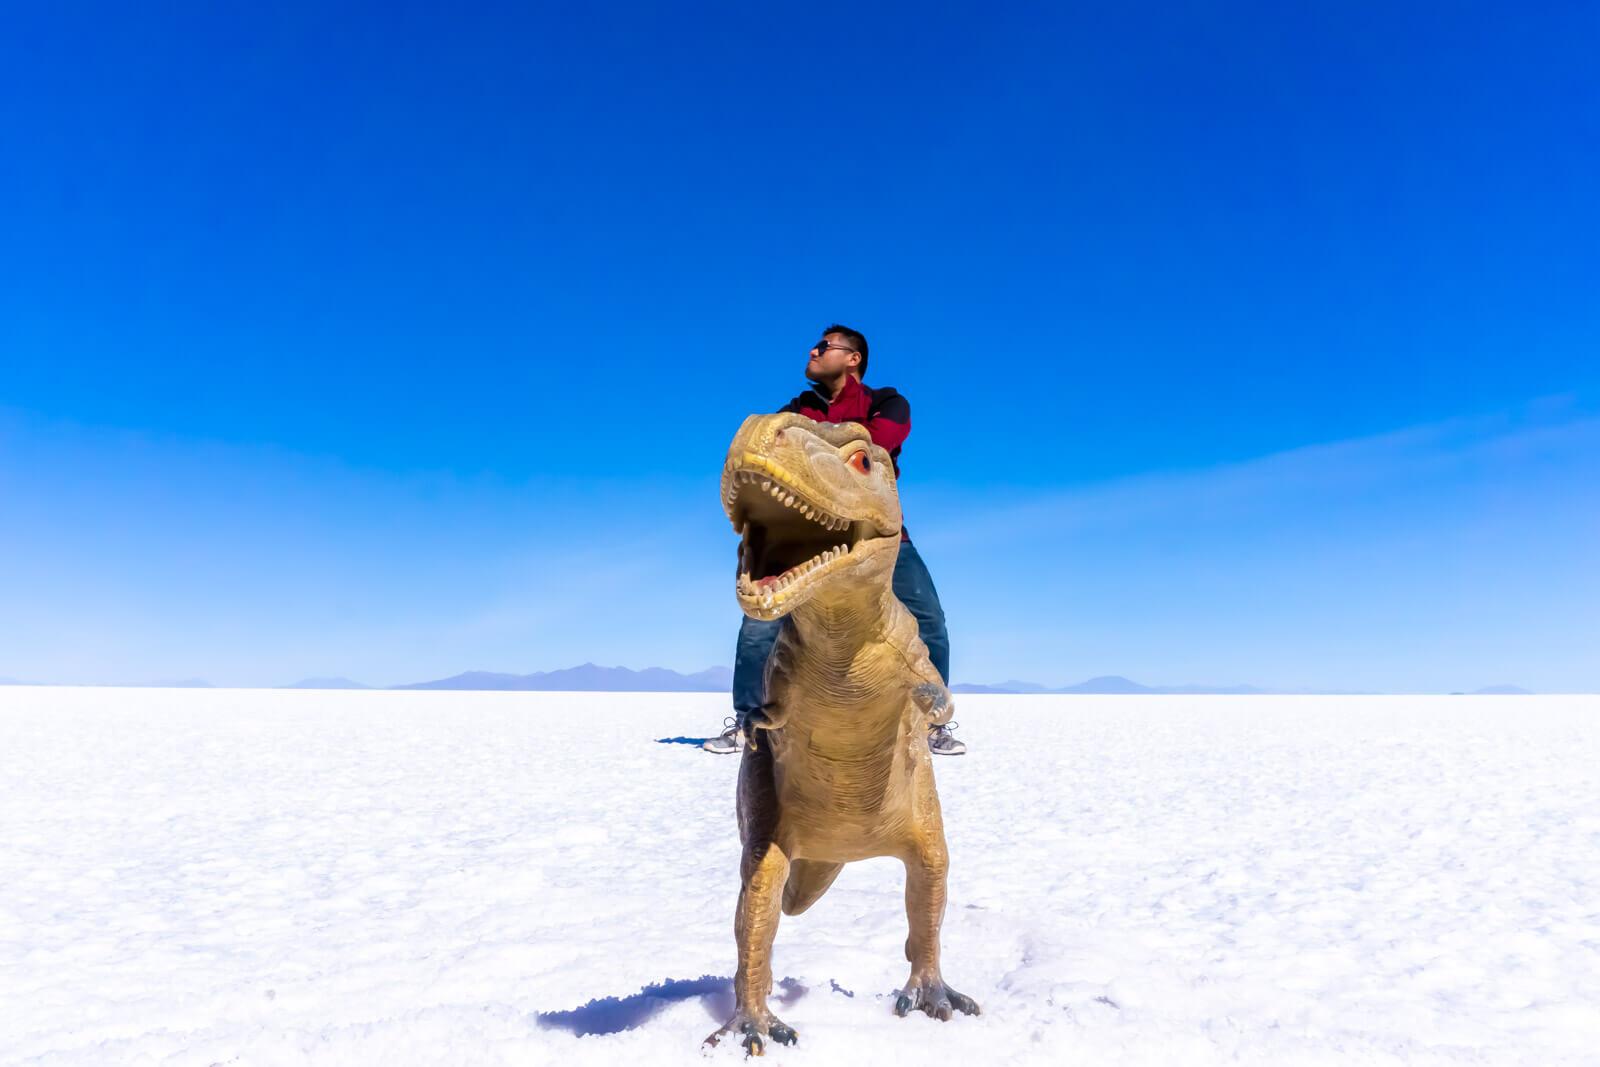 The Man of Wonders riding a T-Rex at the Salar de Uyuni